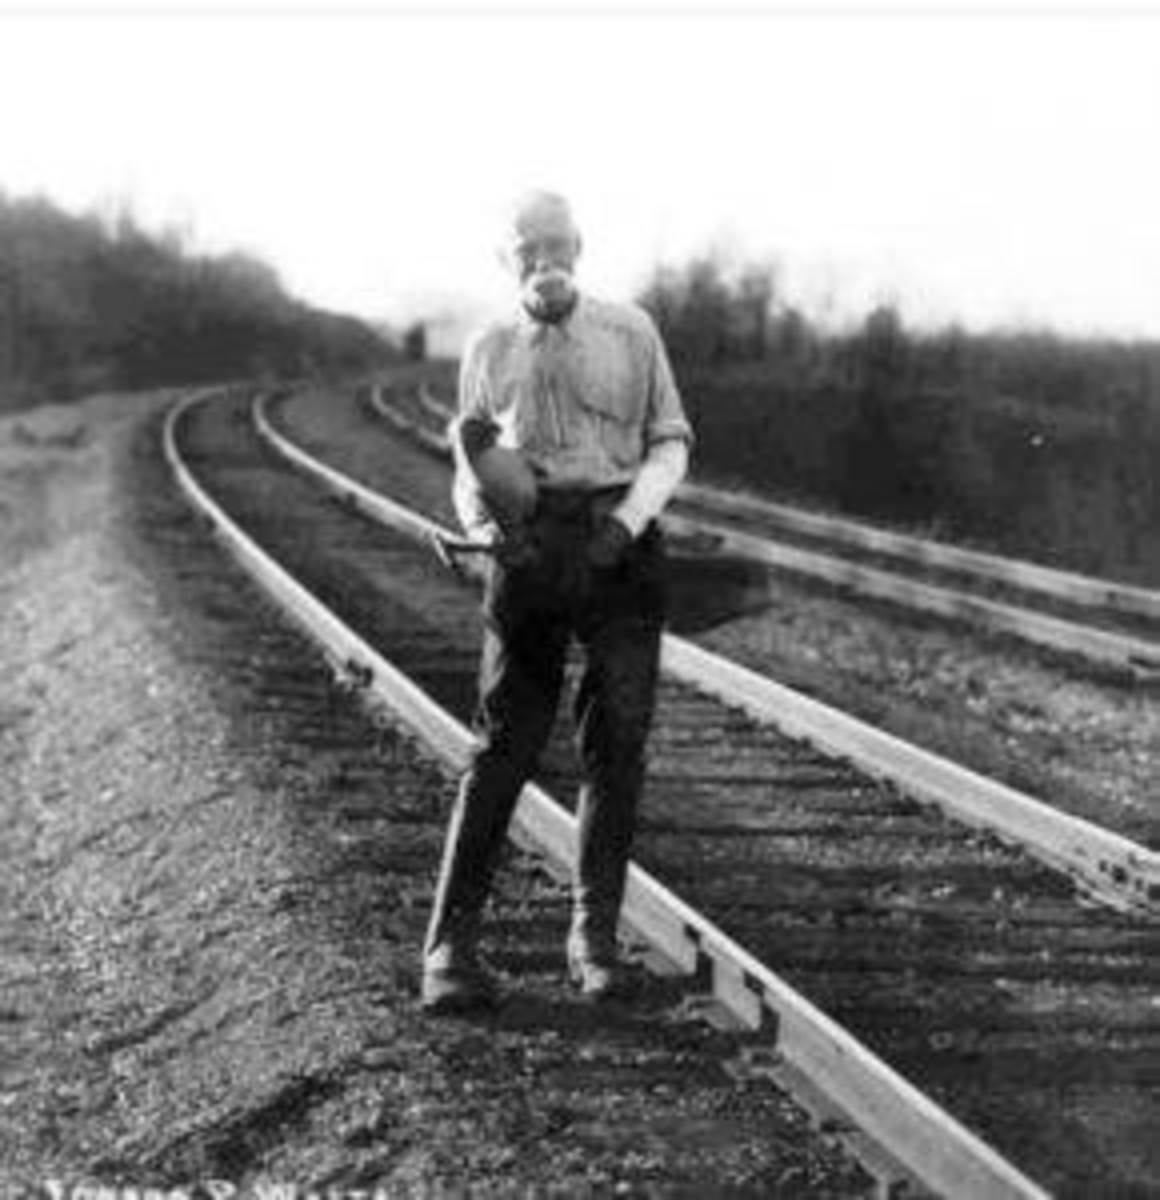 Weston Walking the Rails